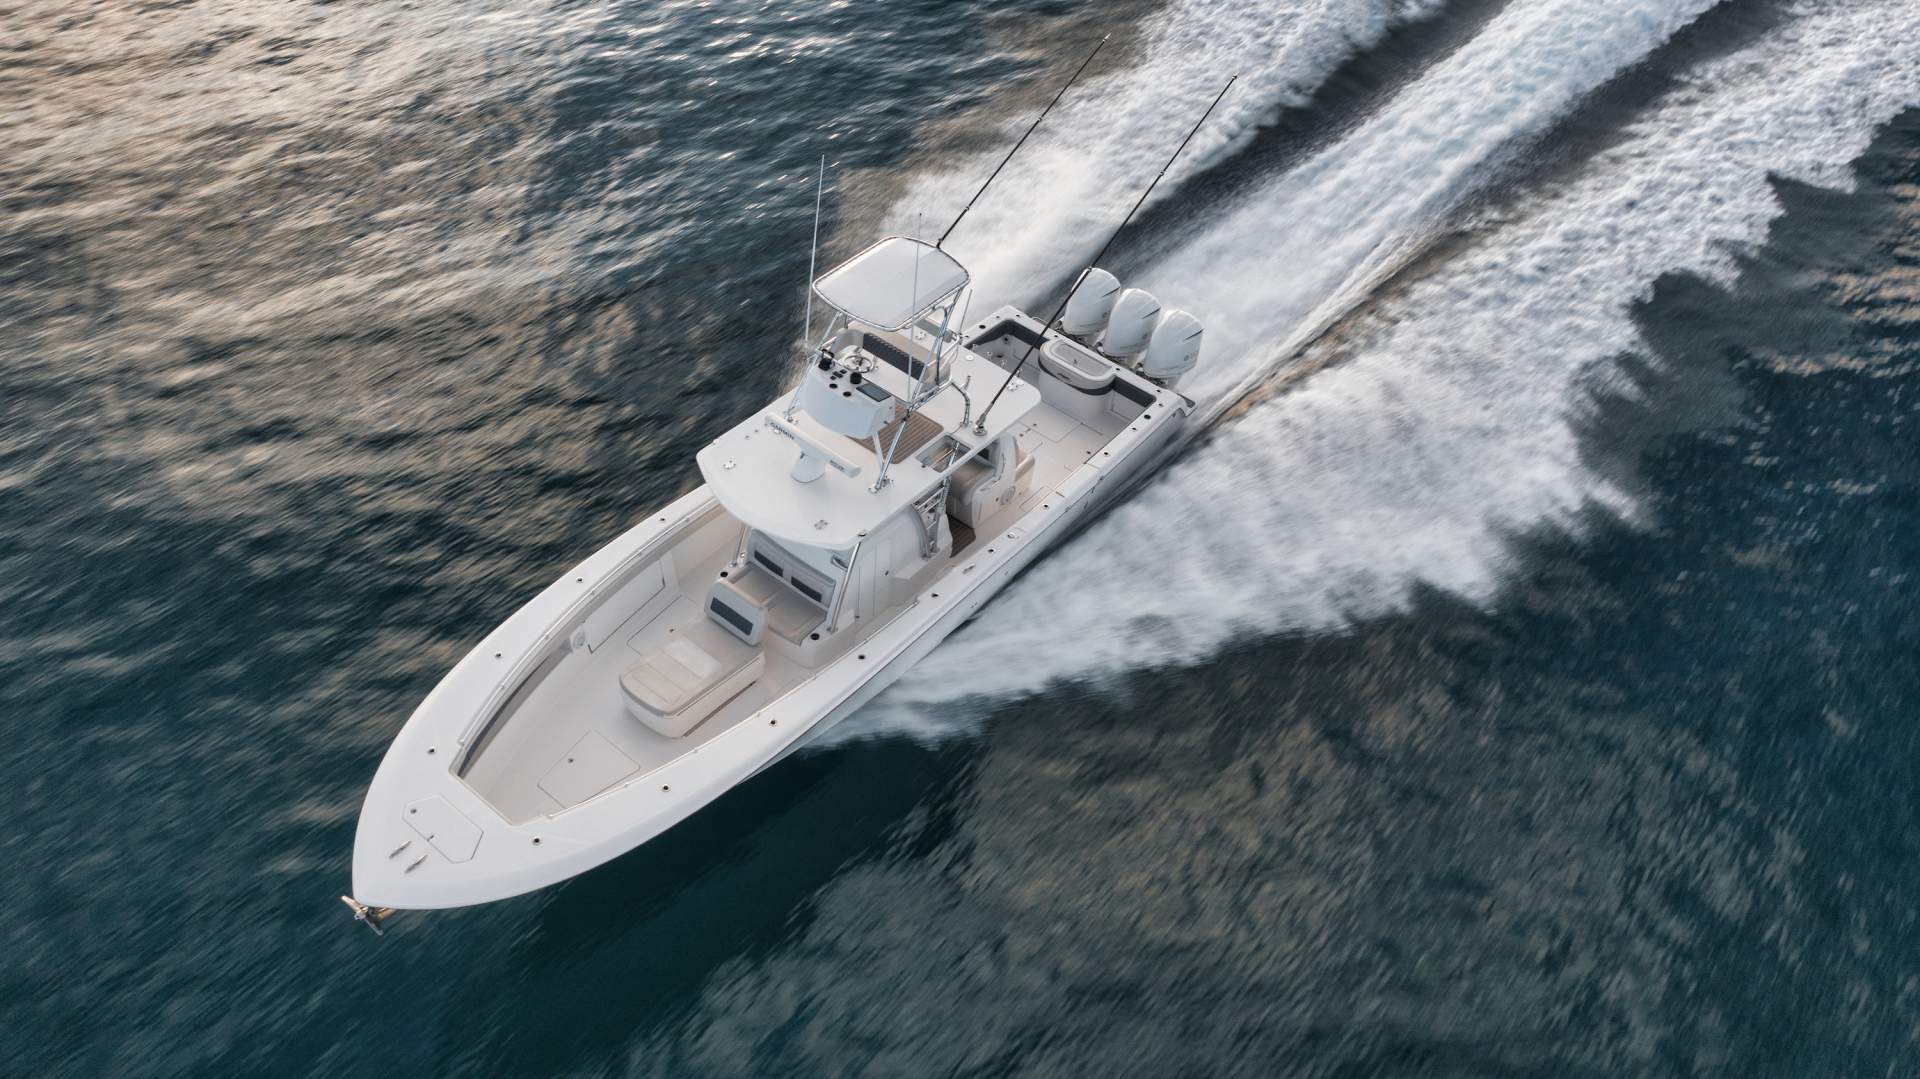 Invincible-Open Fisherman 2017-42 Invincible Jupiter-Florida-United States-1604179   Thumbnail